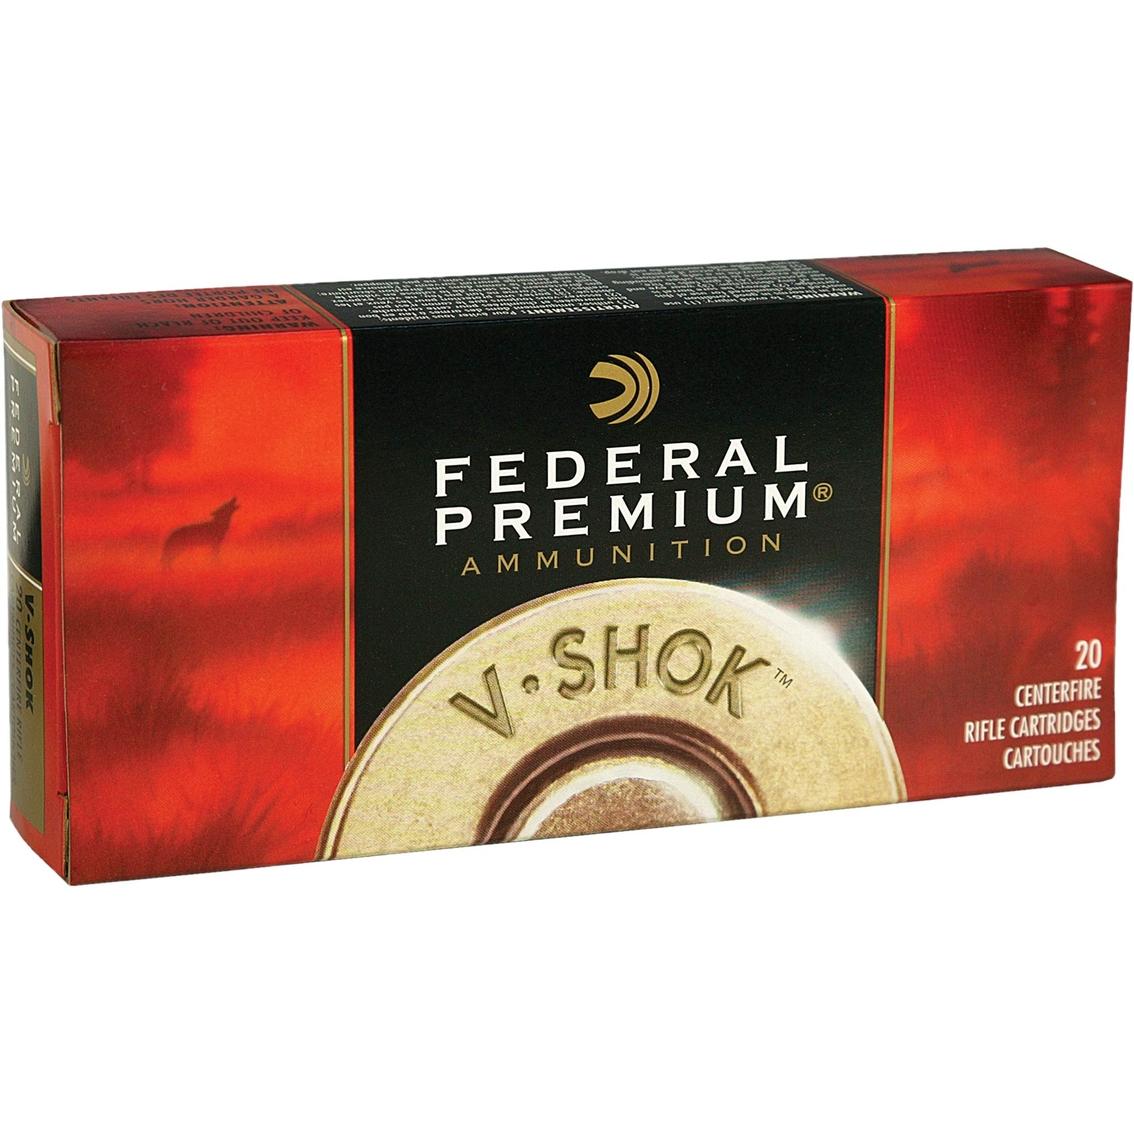 Federal Vital-shok .375 H&h 300 Gr. Nosler Partition, 20 Rounds - Rifle Ammunition - Sports & Outdoors - Shop The Exchange - 웹